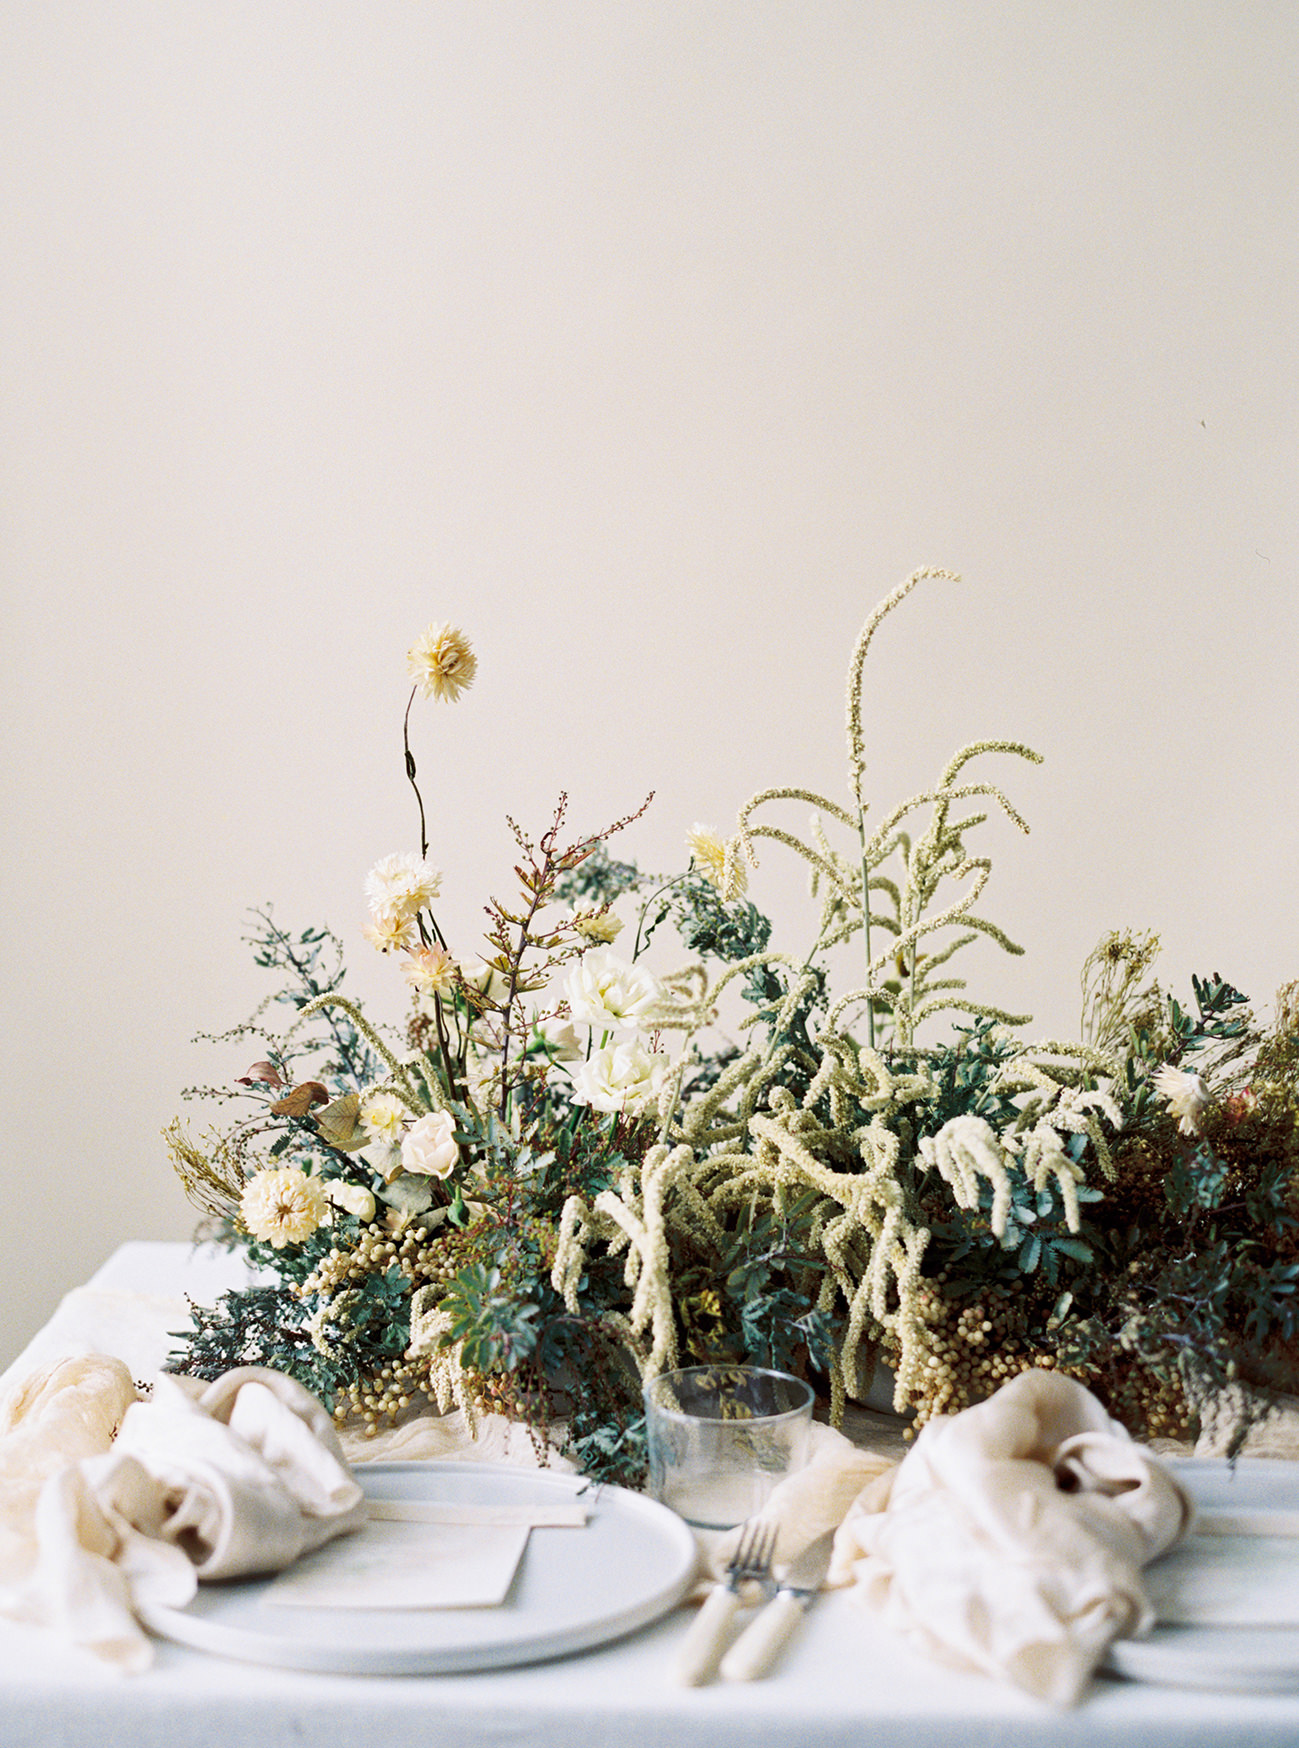 Bridal Inspiration, Wedding Bouquet, Hääkuvaus, Film Wedding Photographer, Table Setting Inspiration, Stationery, Dried Flowers, www.nordandmae.com, www.susannanordvall (17).jpg